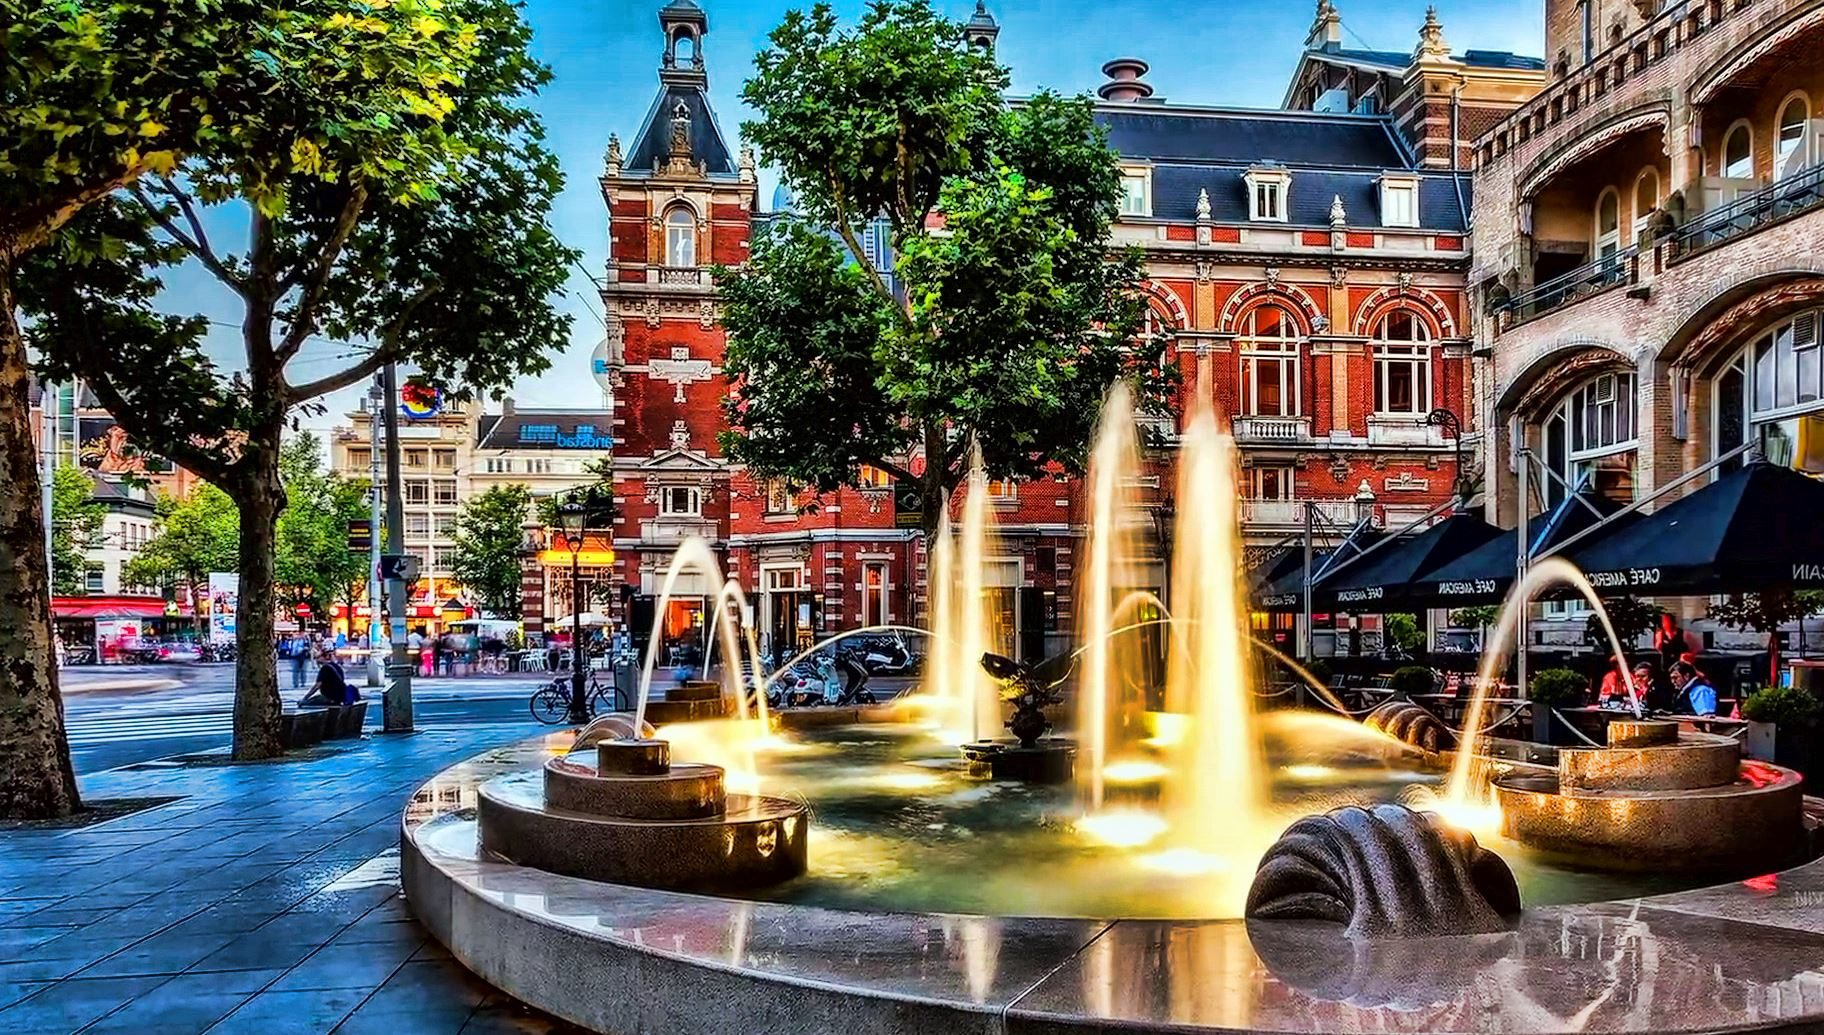 Foto gratis fontana centro citt architettura paesaggio urbano via citt